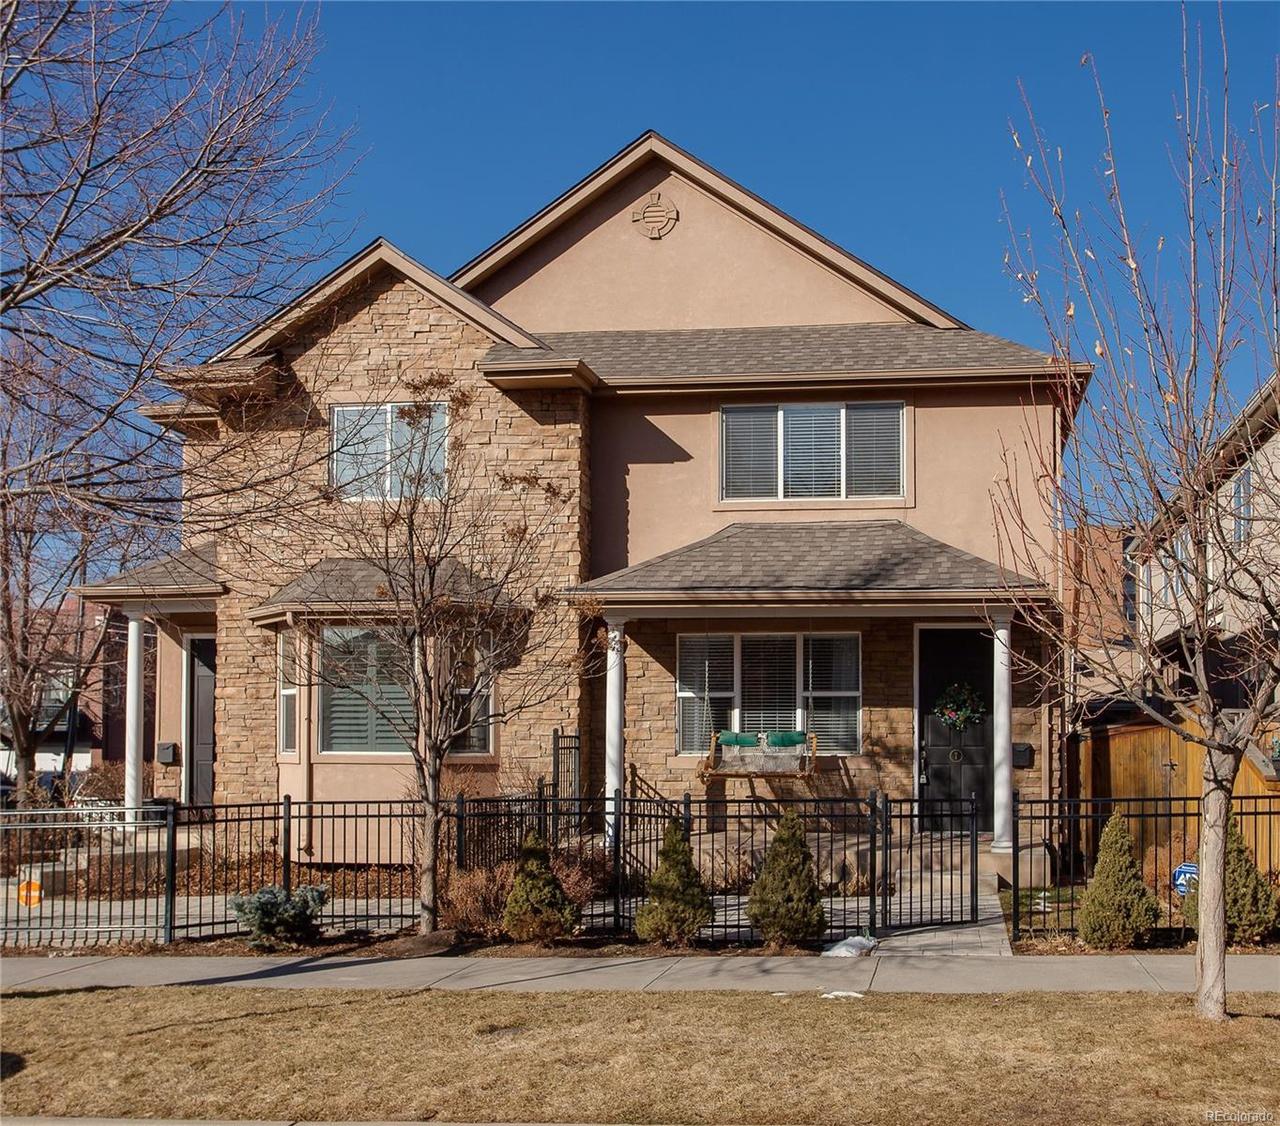 7 Garfield St, Denver, CO 80206 | MLS# 9189739 | Redfin